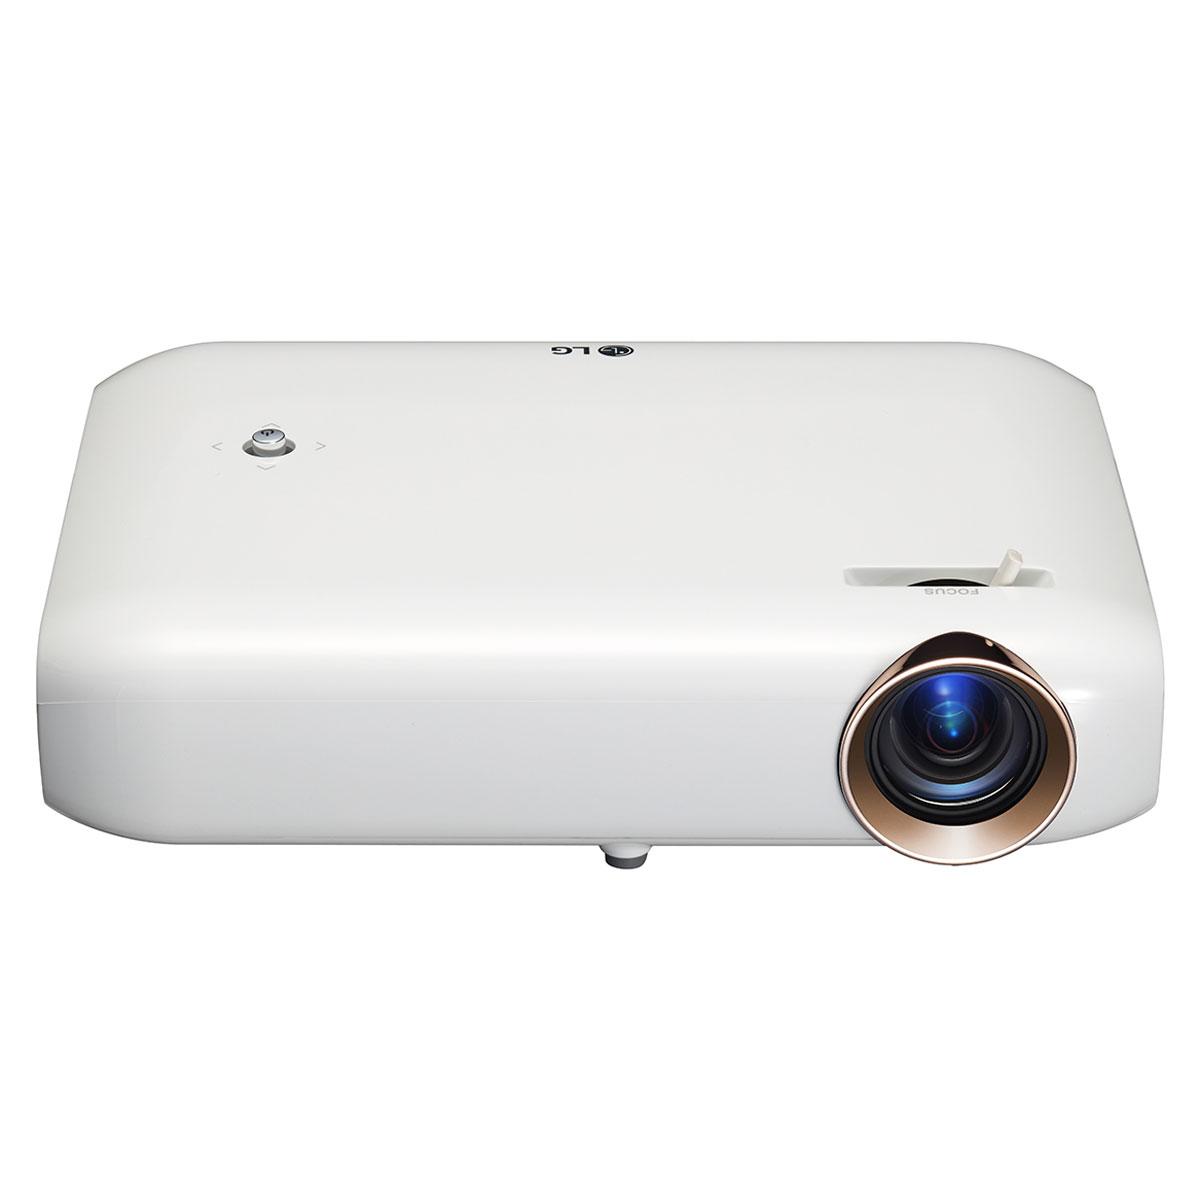 Vidéoprojecteur LG PW1500G Vidéoprojecteur portable DLP 3D WXGA 1500 Lumens avec Bluetooth, WiDi, Miracast, Screen Share, HDMI et USB